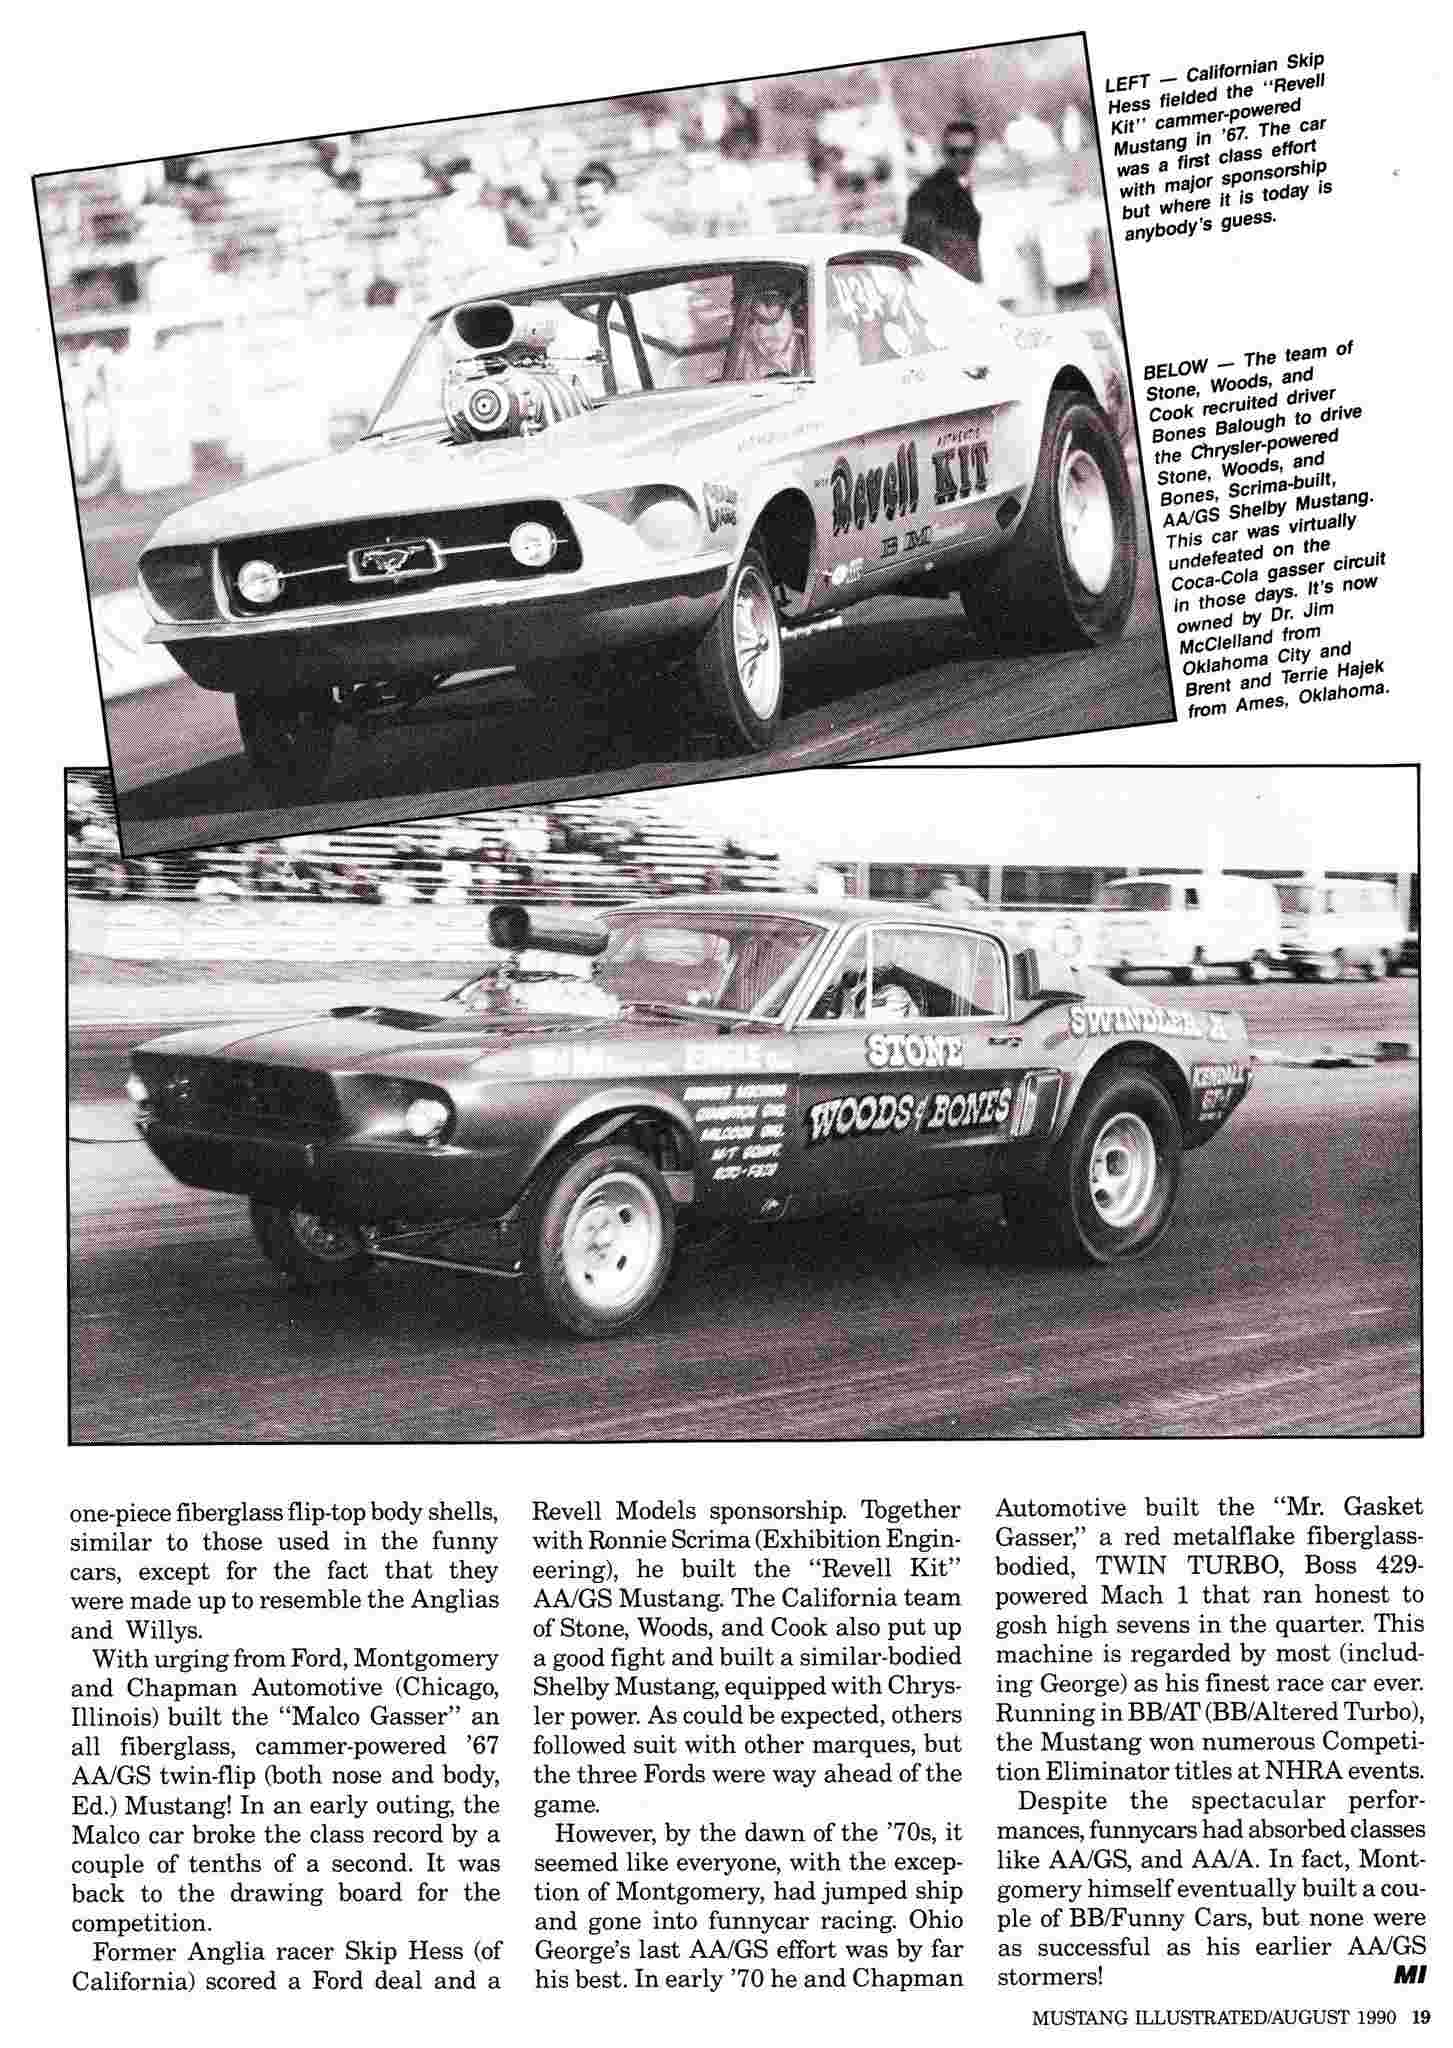 """Ohio George"" Montgomery- 1967 lightweight fiberglass Mustang-The Malco Gasser Malco_11"